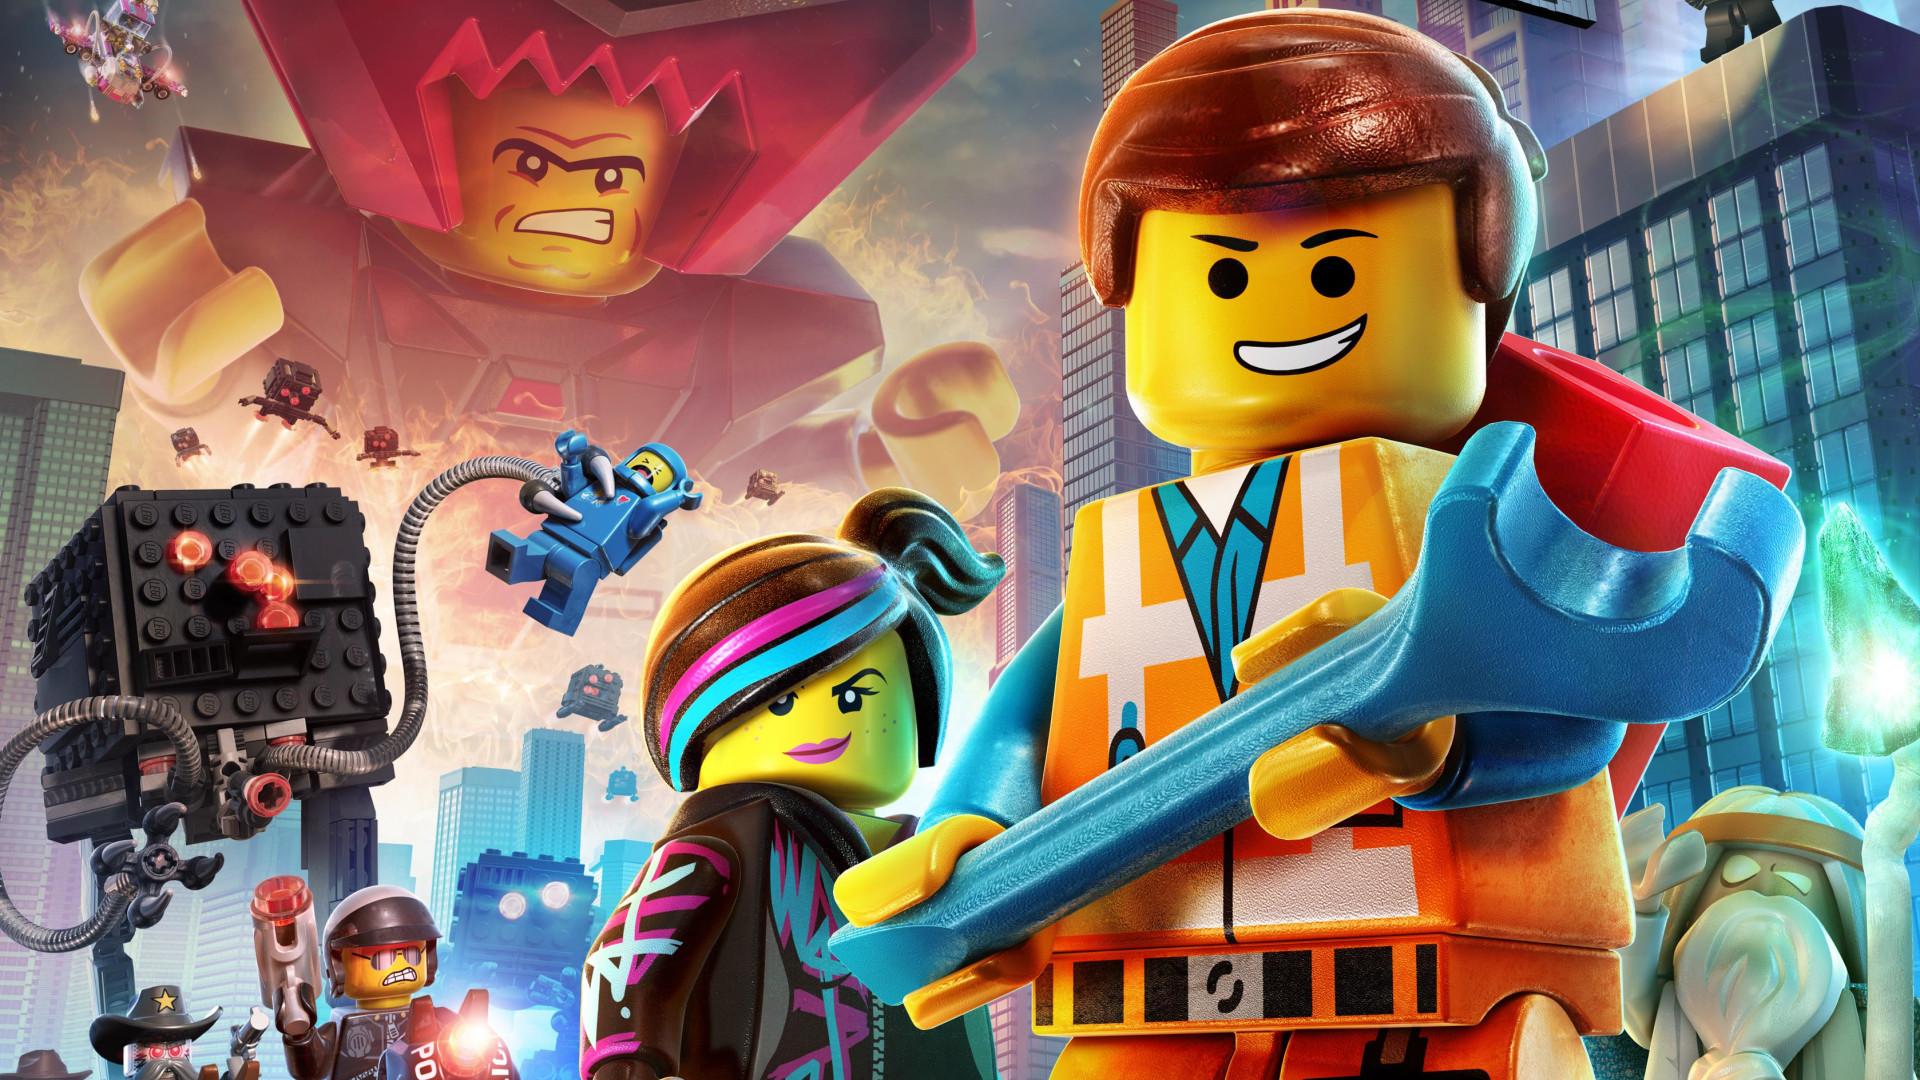 Weekly Wallpaper: Put Some LEGO People On Your Desktop | Lifehacker .